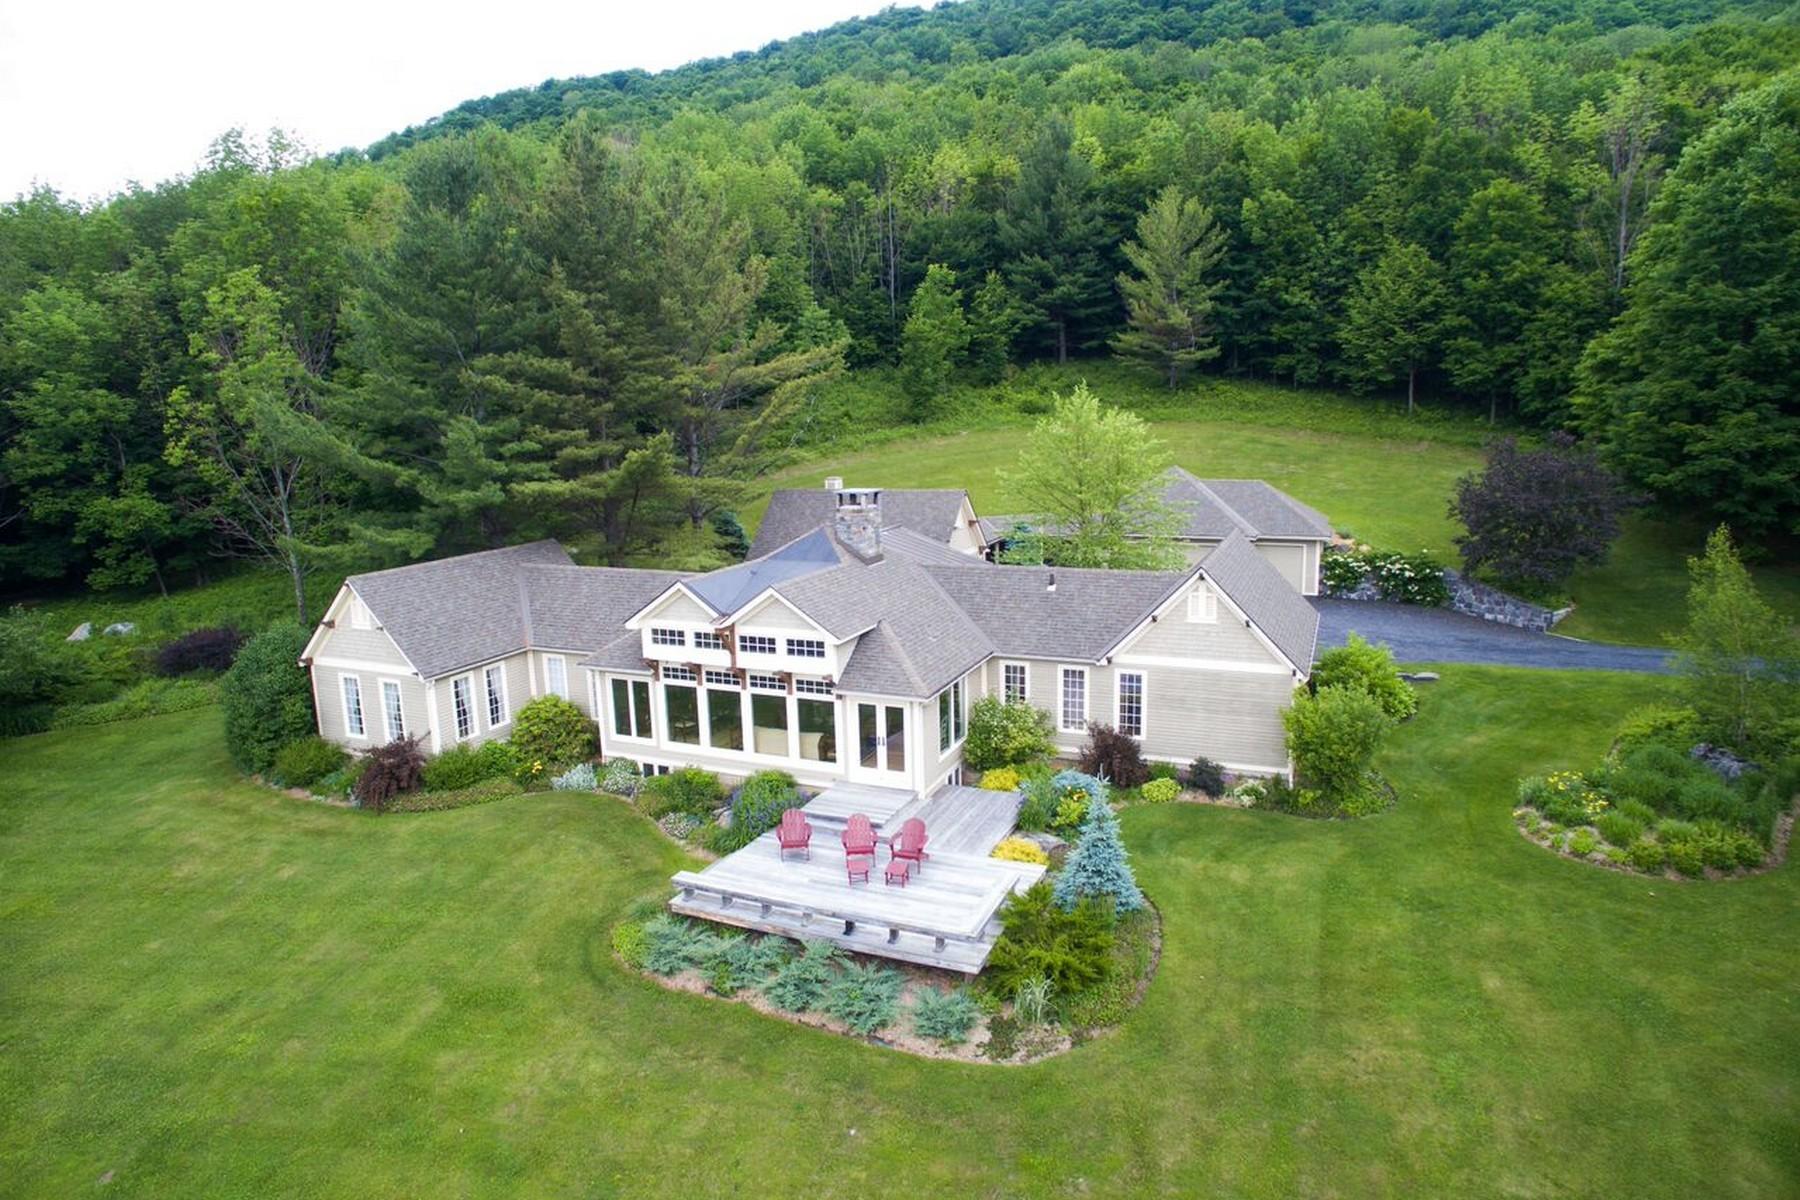 Moradia para Venda às Private Estate with Views 395 Red Tail Lane Dorset Hollow Dorset, Vermont, 05251 Estados Unidos